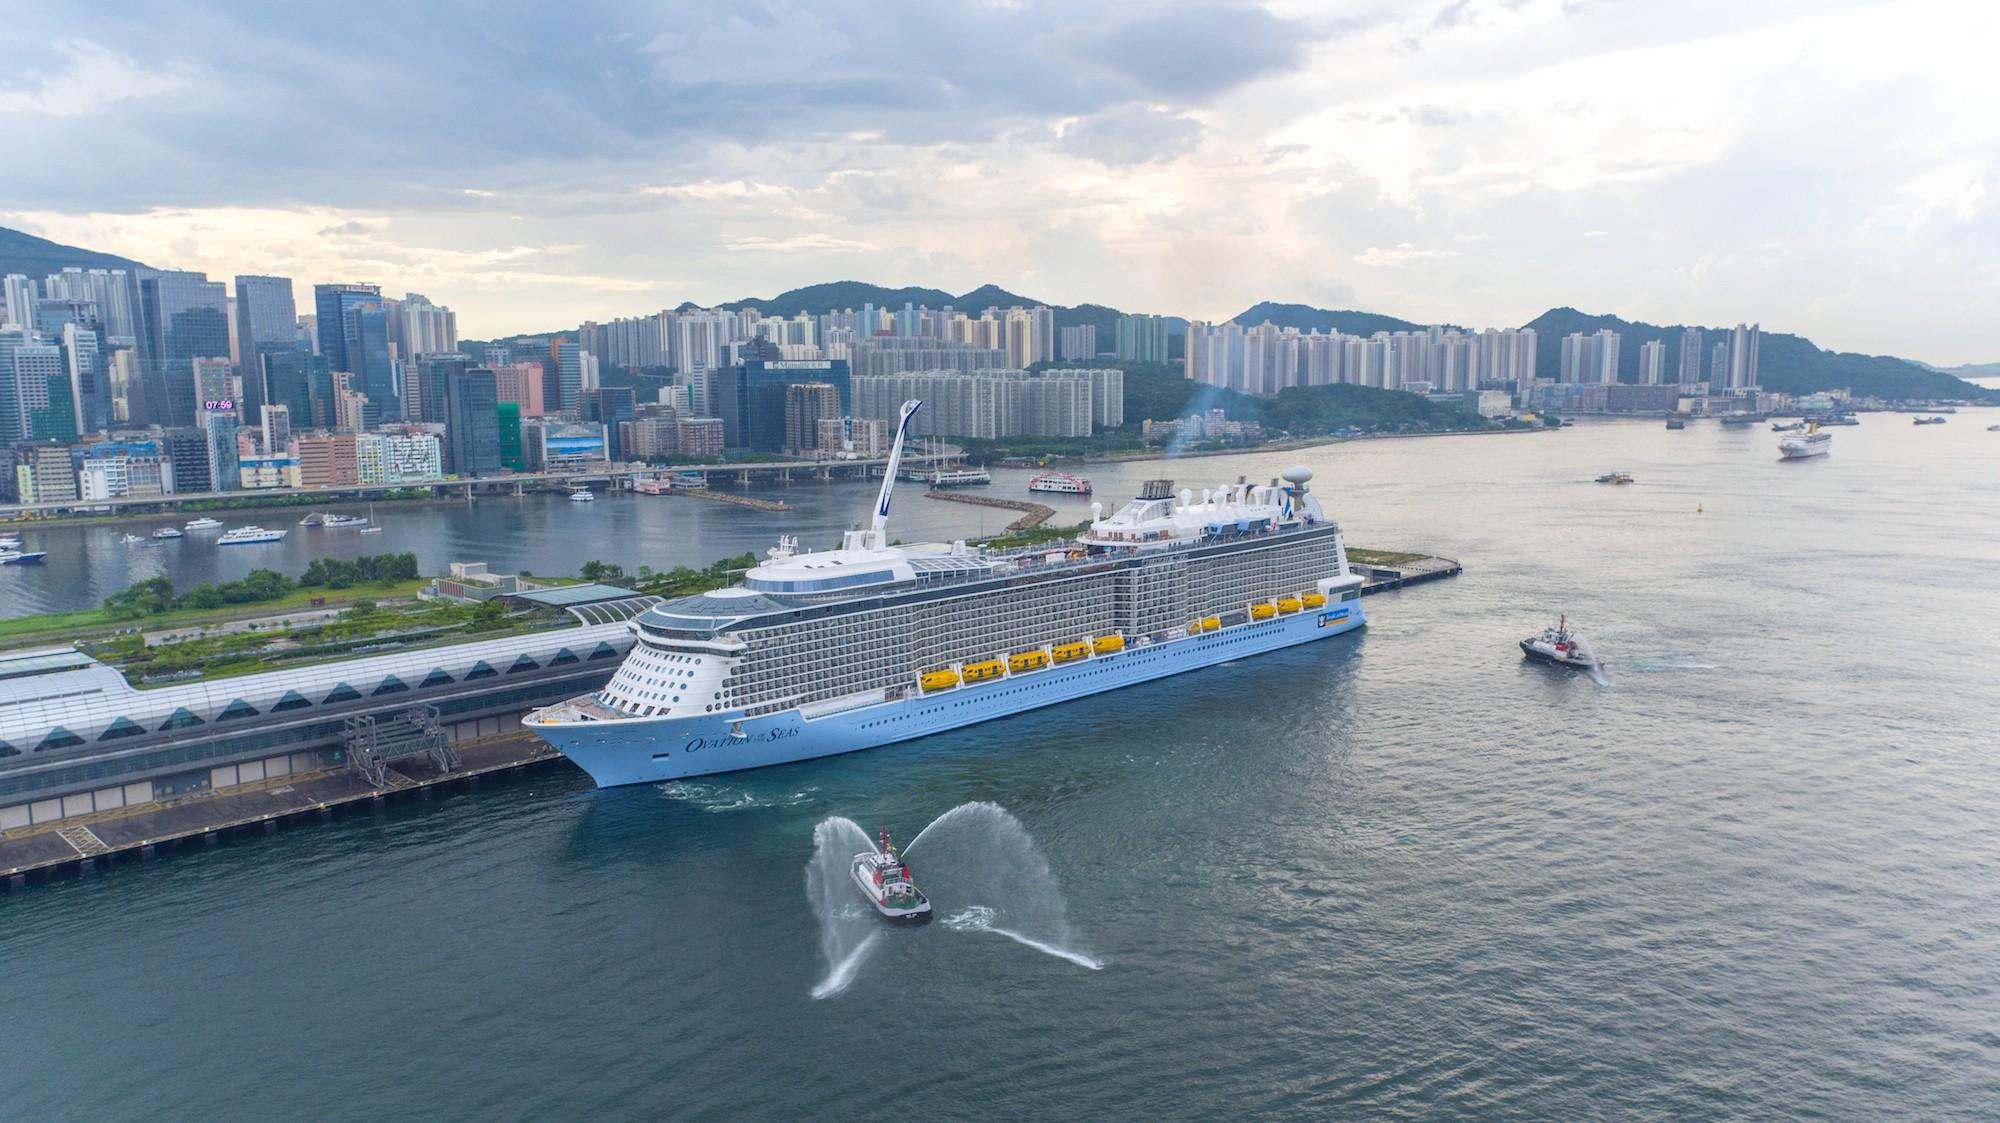 Royal Caribbean Cruises This Magnificent Life